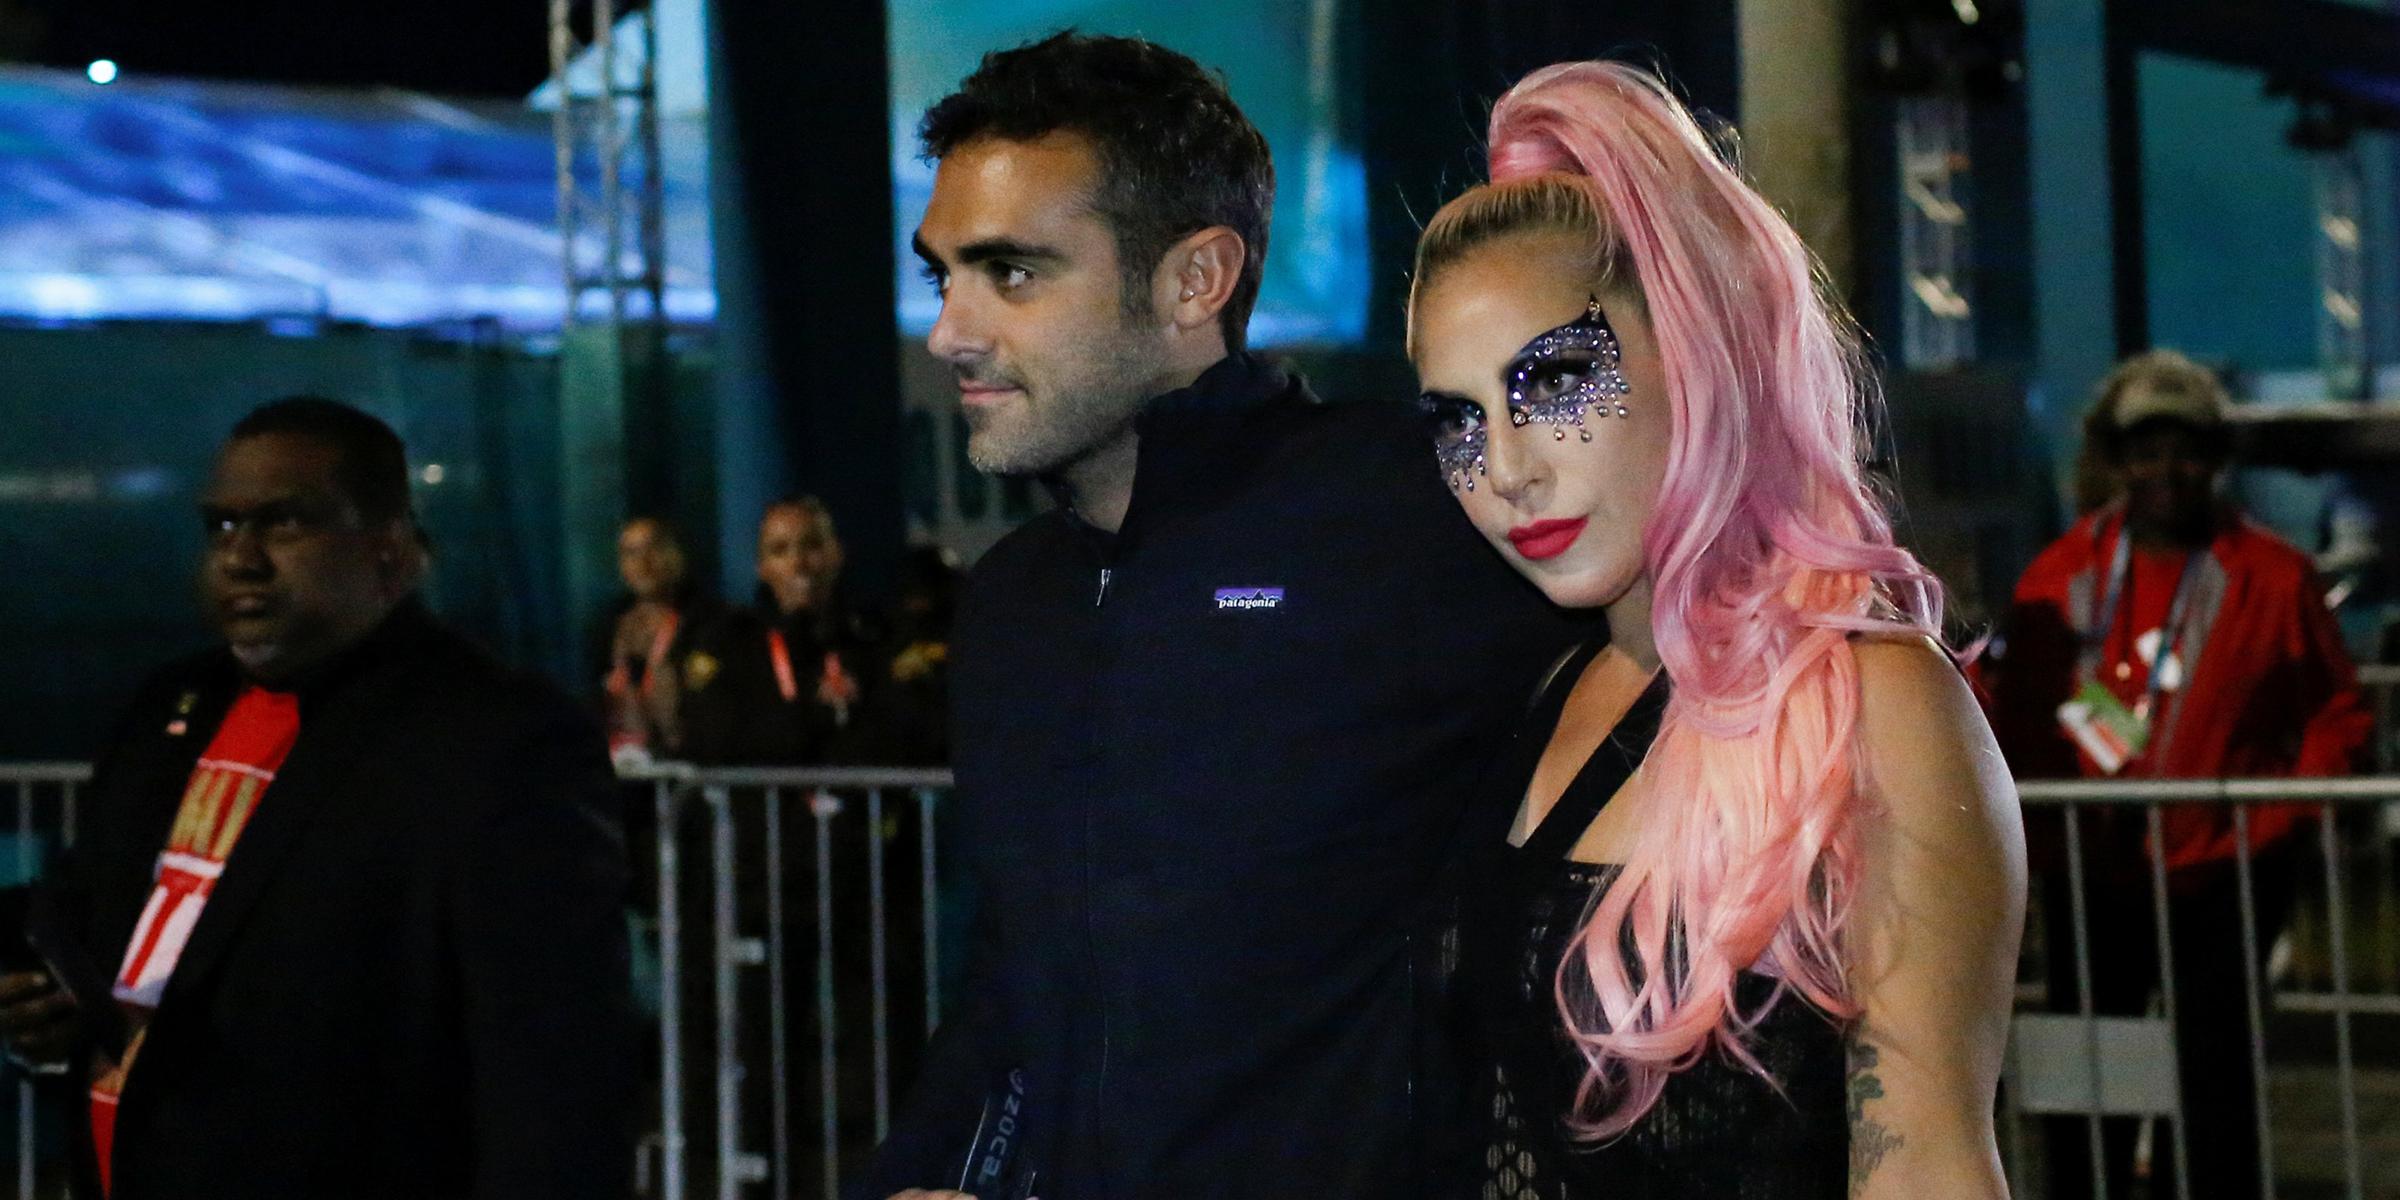 Ex Of Lady Gaga S Boyfriend Reveals Surprising Reaction To Romance